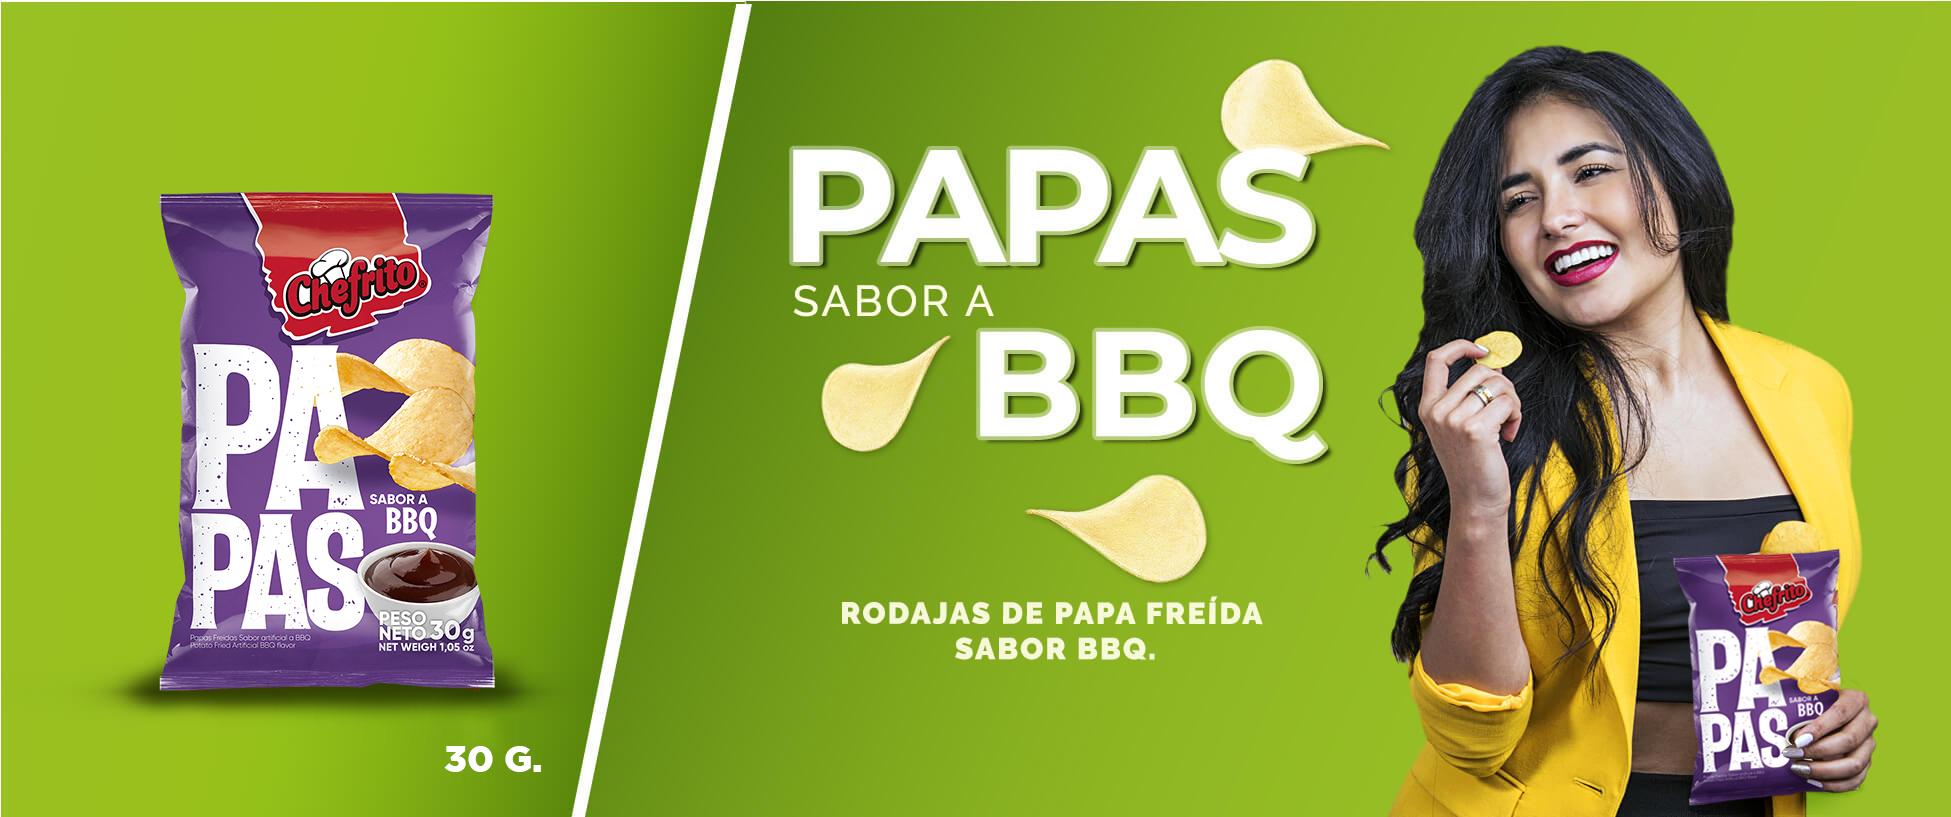 Papas 6